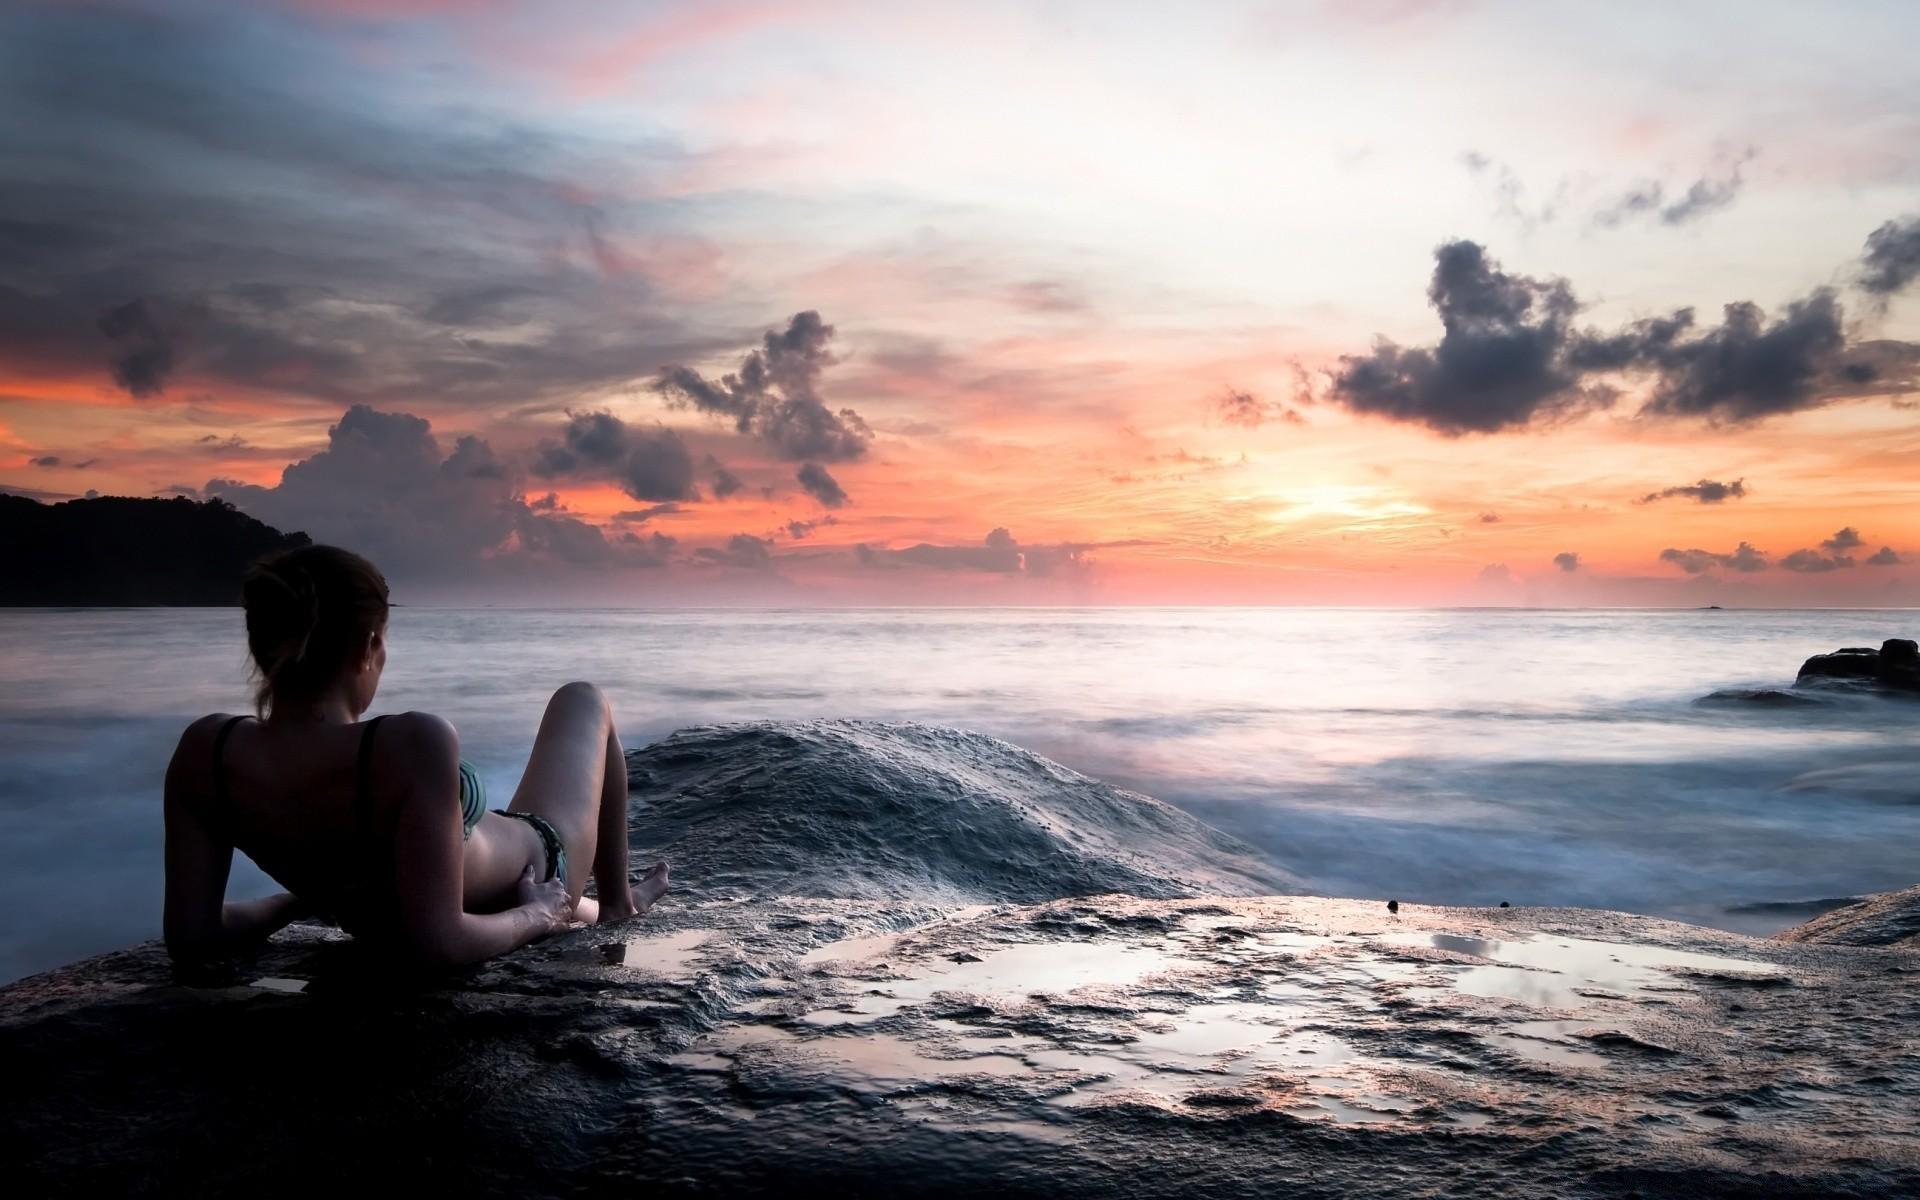 Красивая девушка на фоне красивого пейзажа залезла под стул